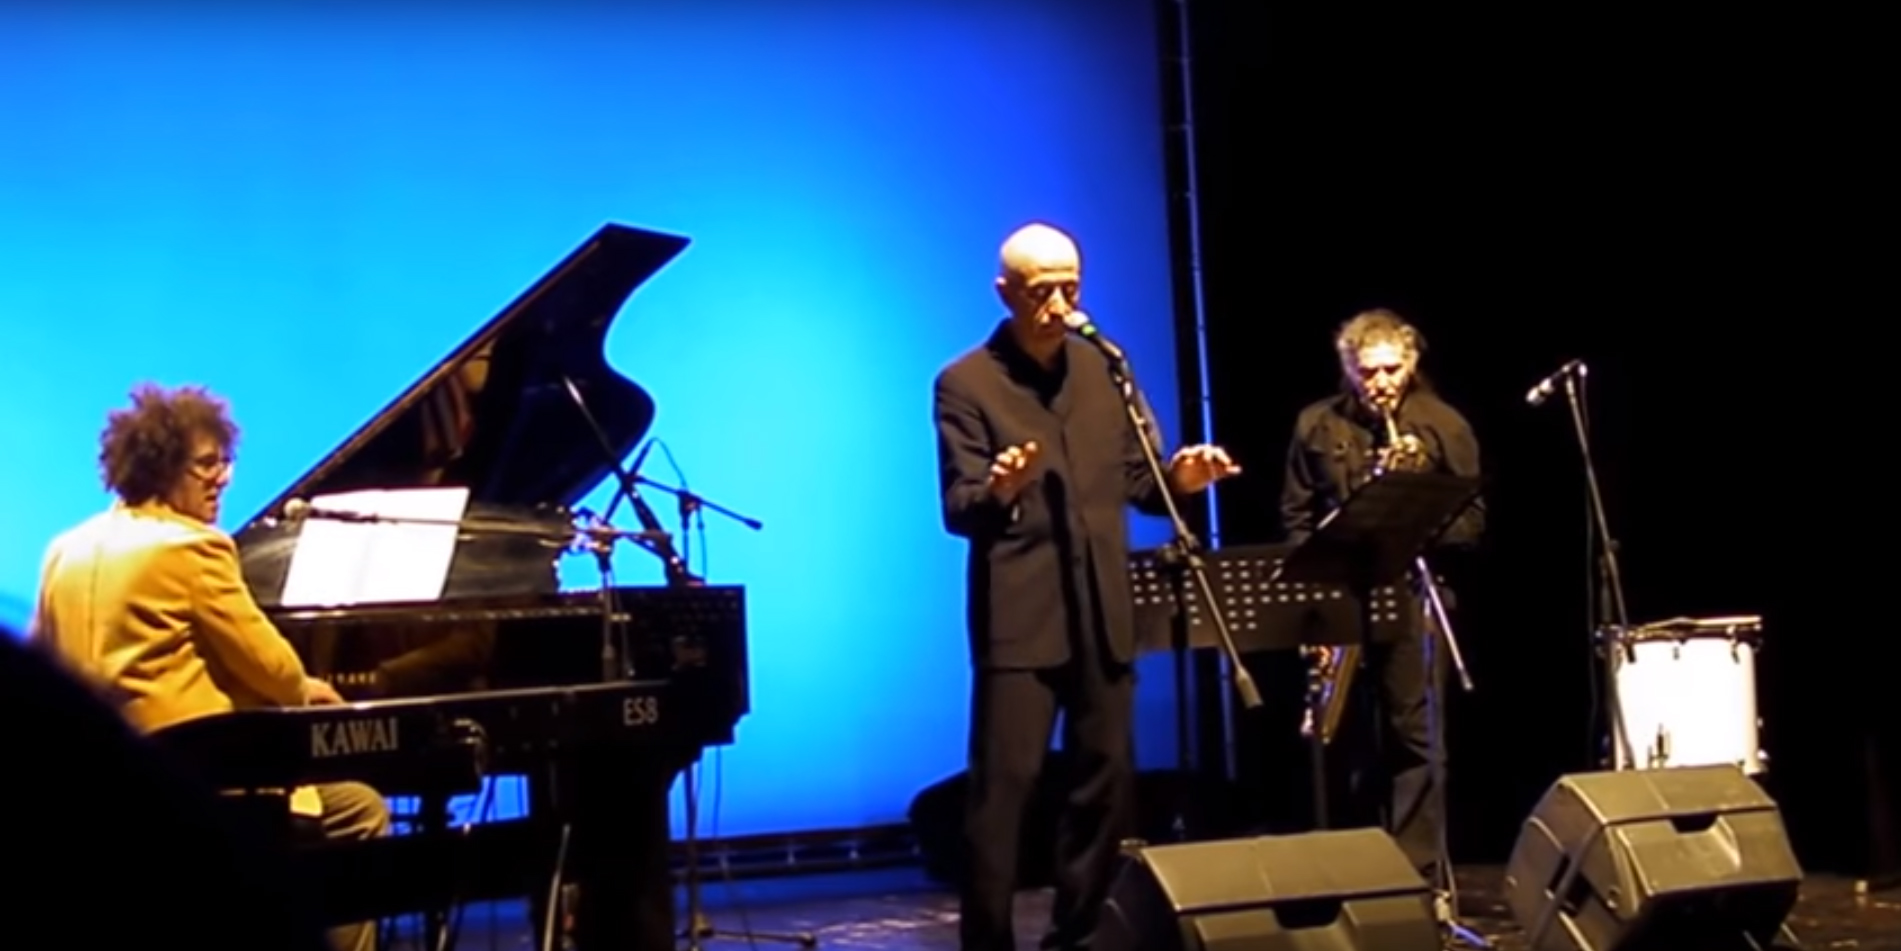 Natalio Mangalavite, Peppe Servillo e Javier Girotto